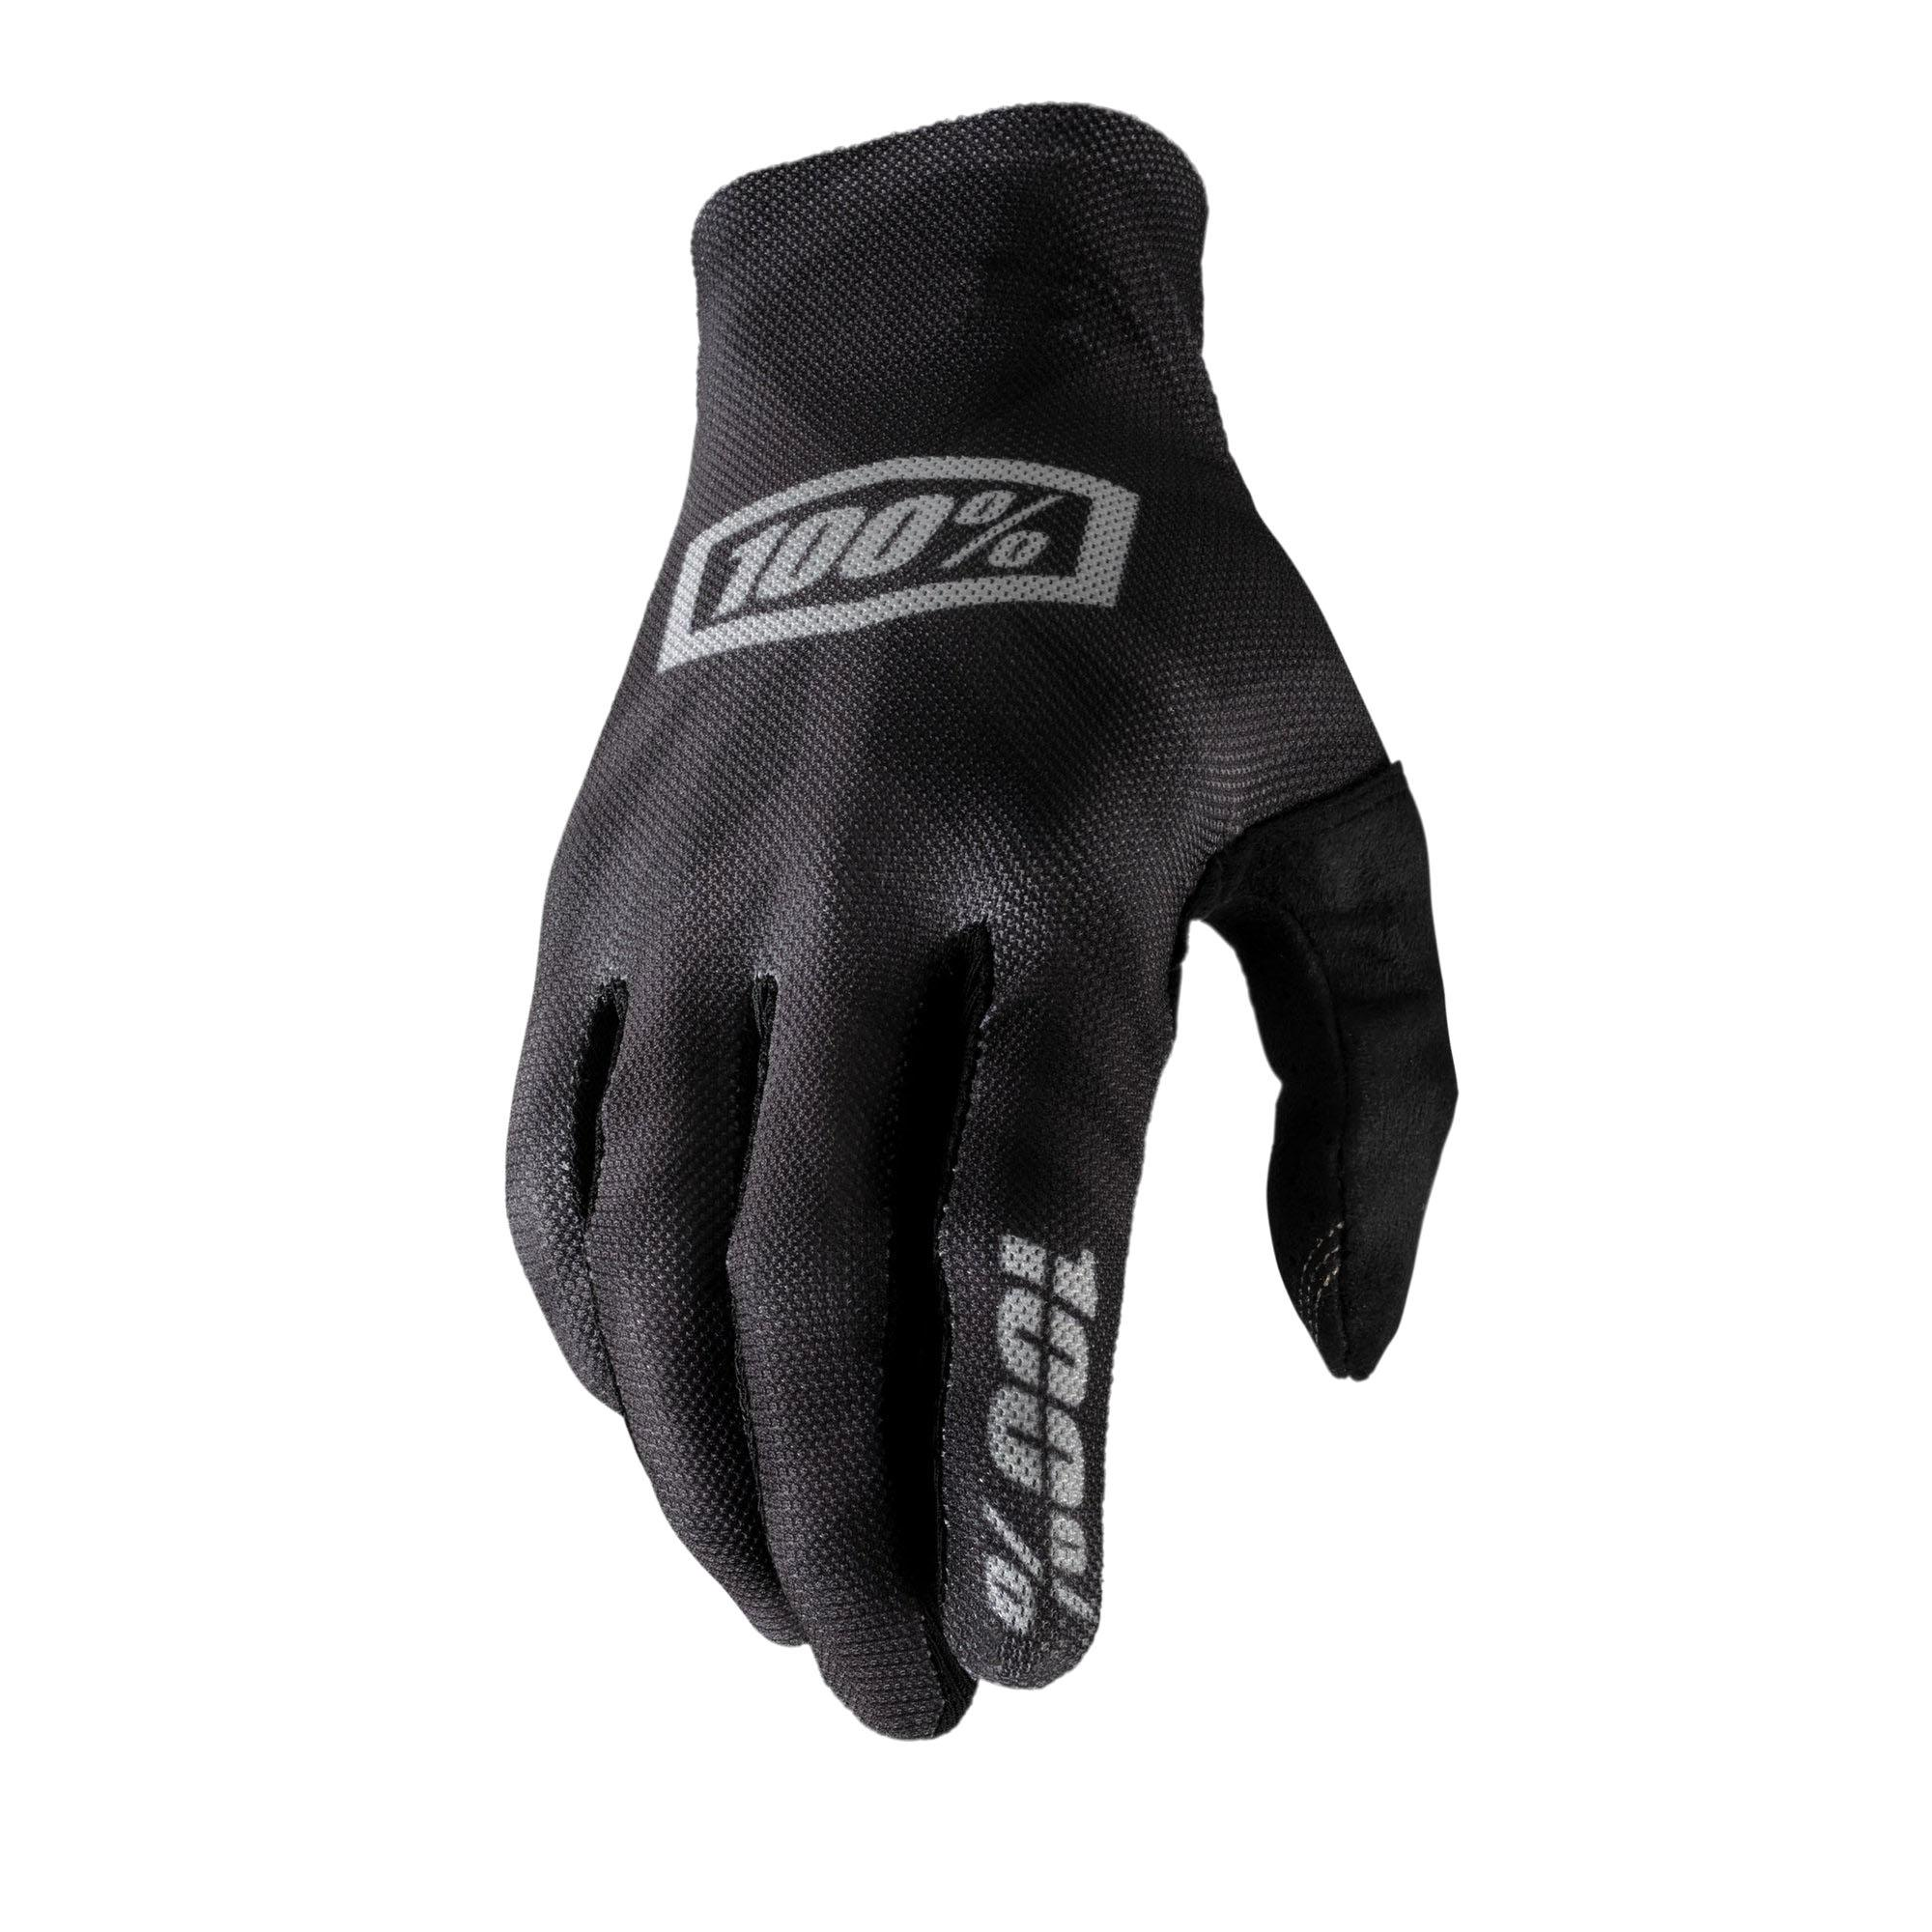 CELIUM Glove Black/Silver